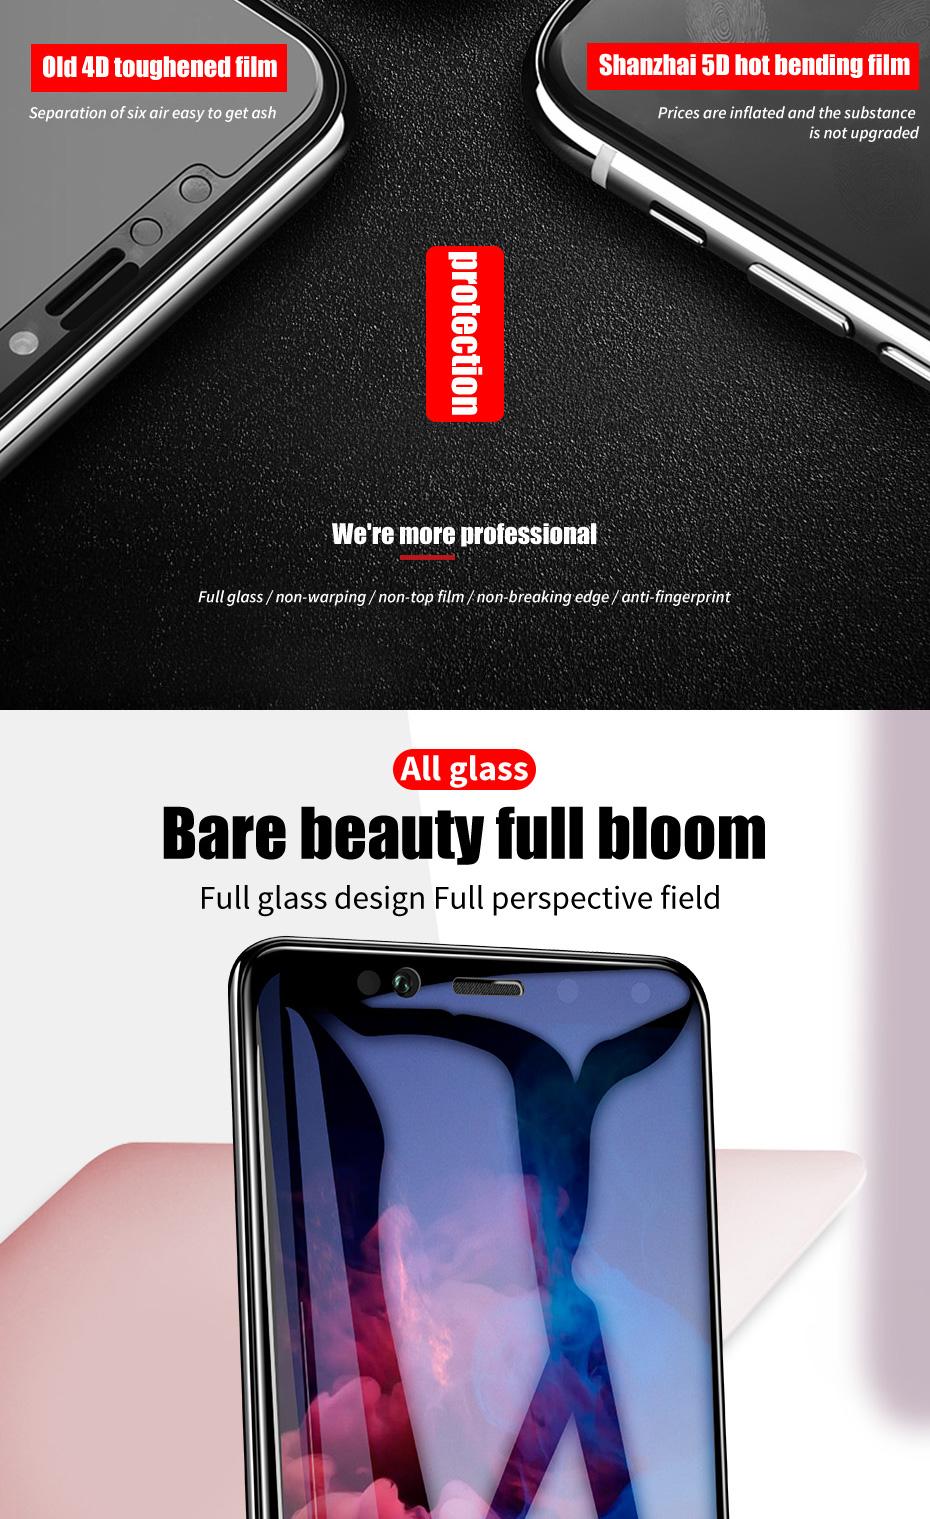 ZNP 5D Screen Protector Tempered Glass For Xiaomi Redmi Note 7 5 Pro Redmi 4X 7A 7 6 Protective Glass For Redmi 5 Plus k20 Film 3